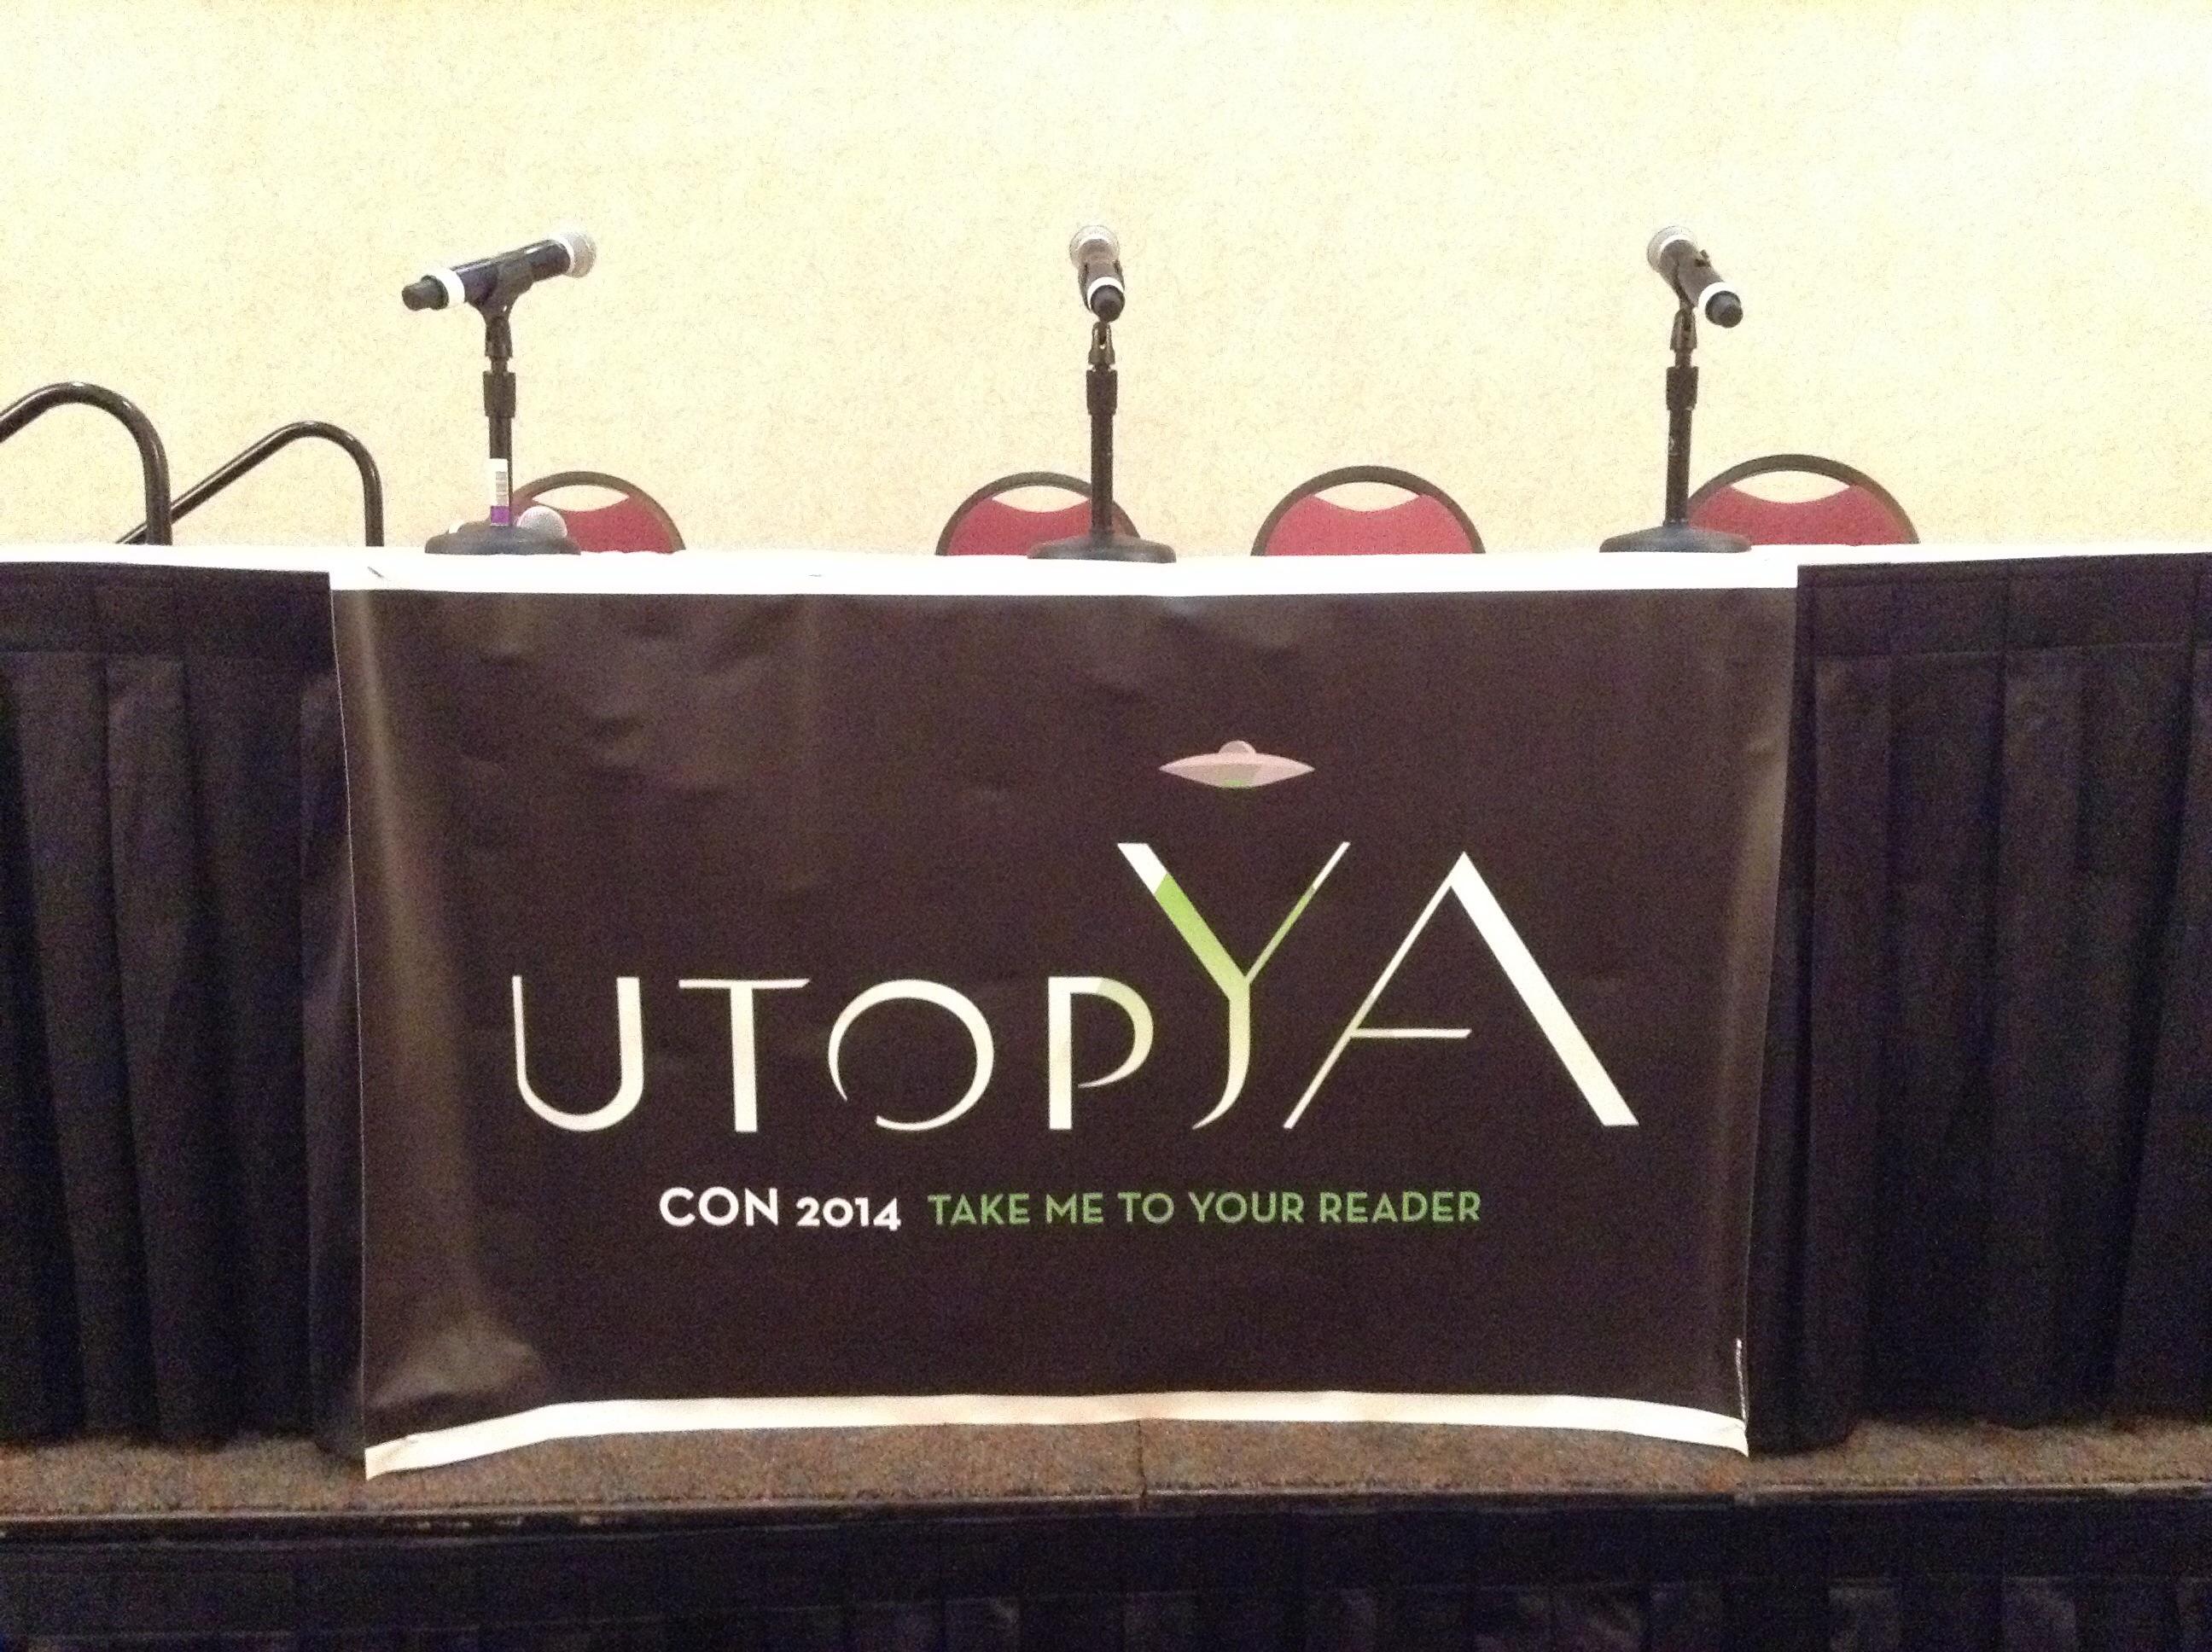 utopya con 2014 001